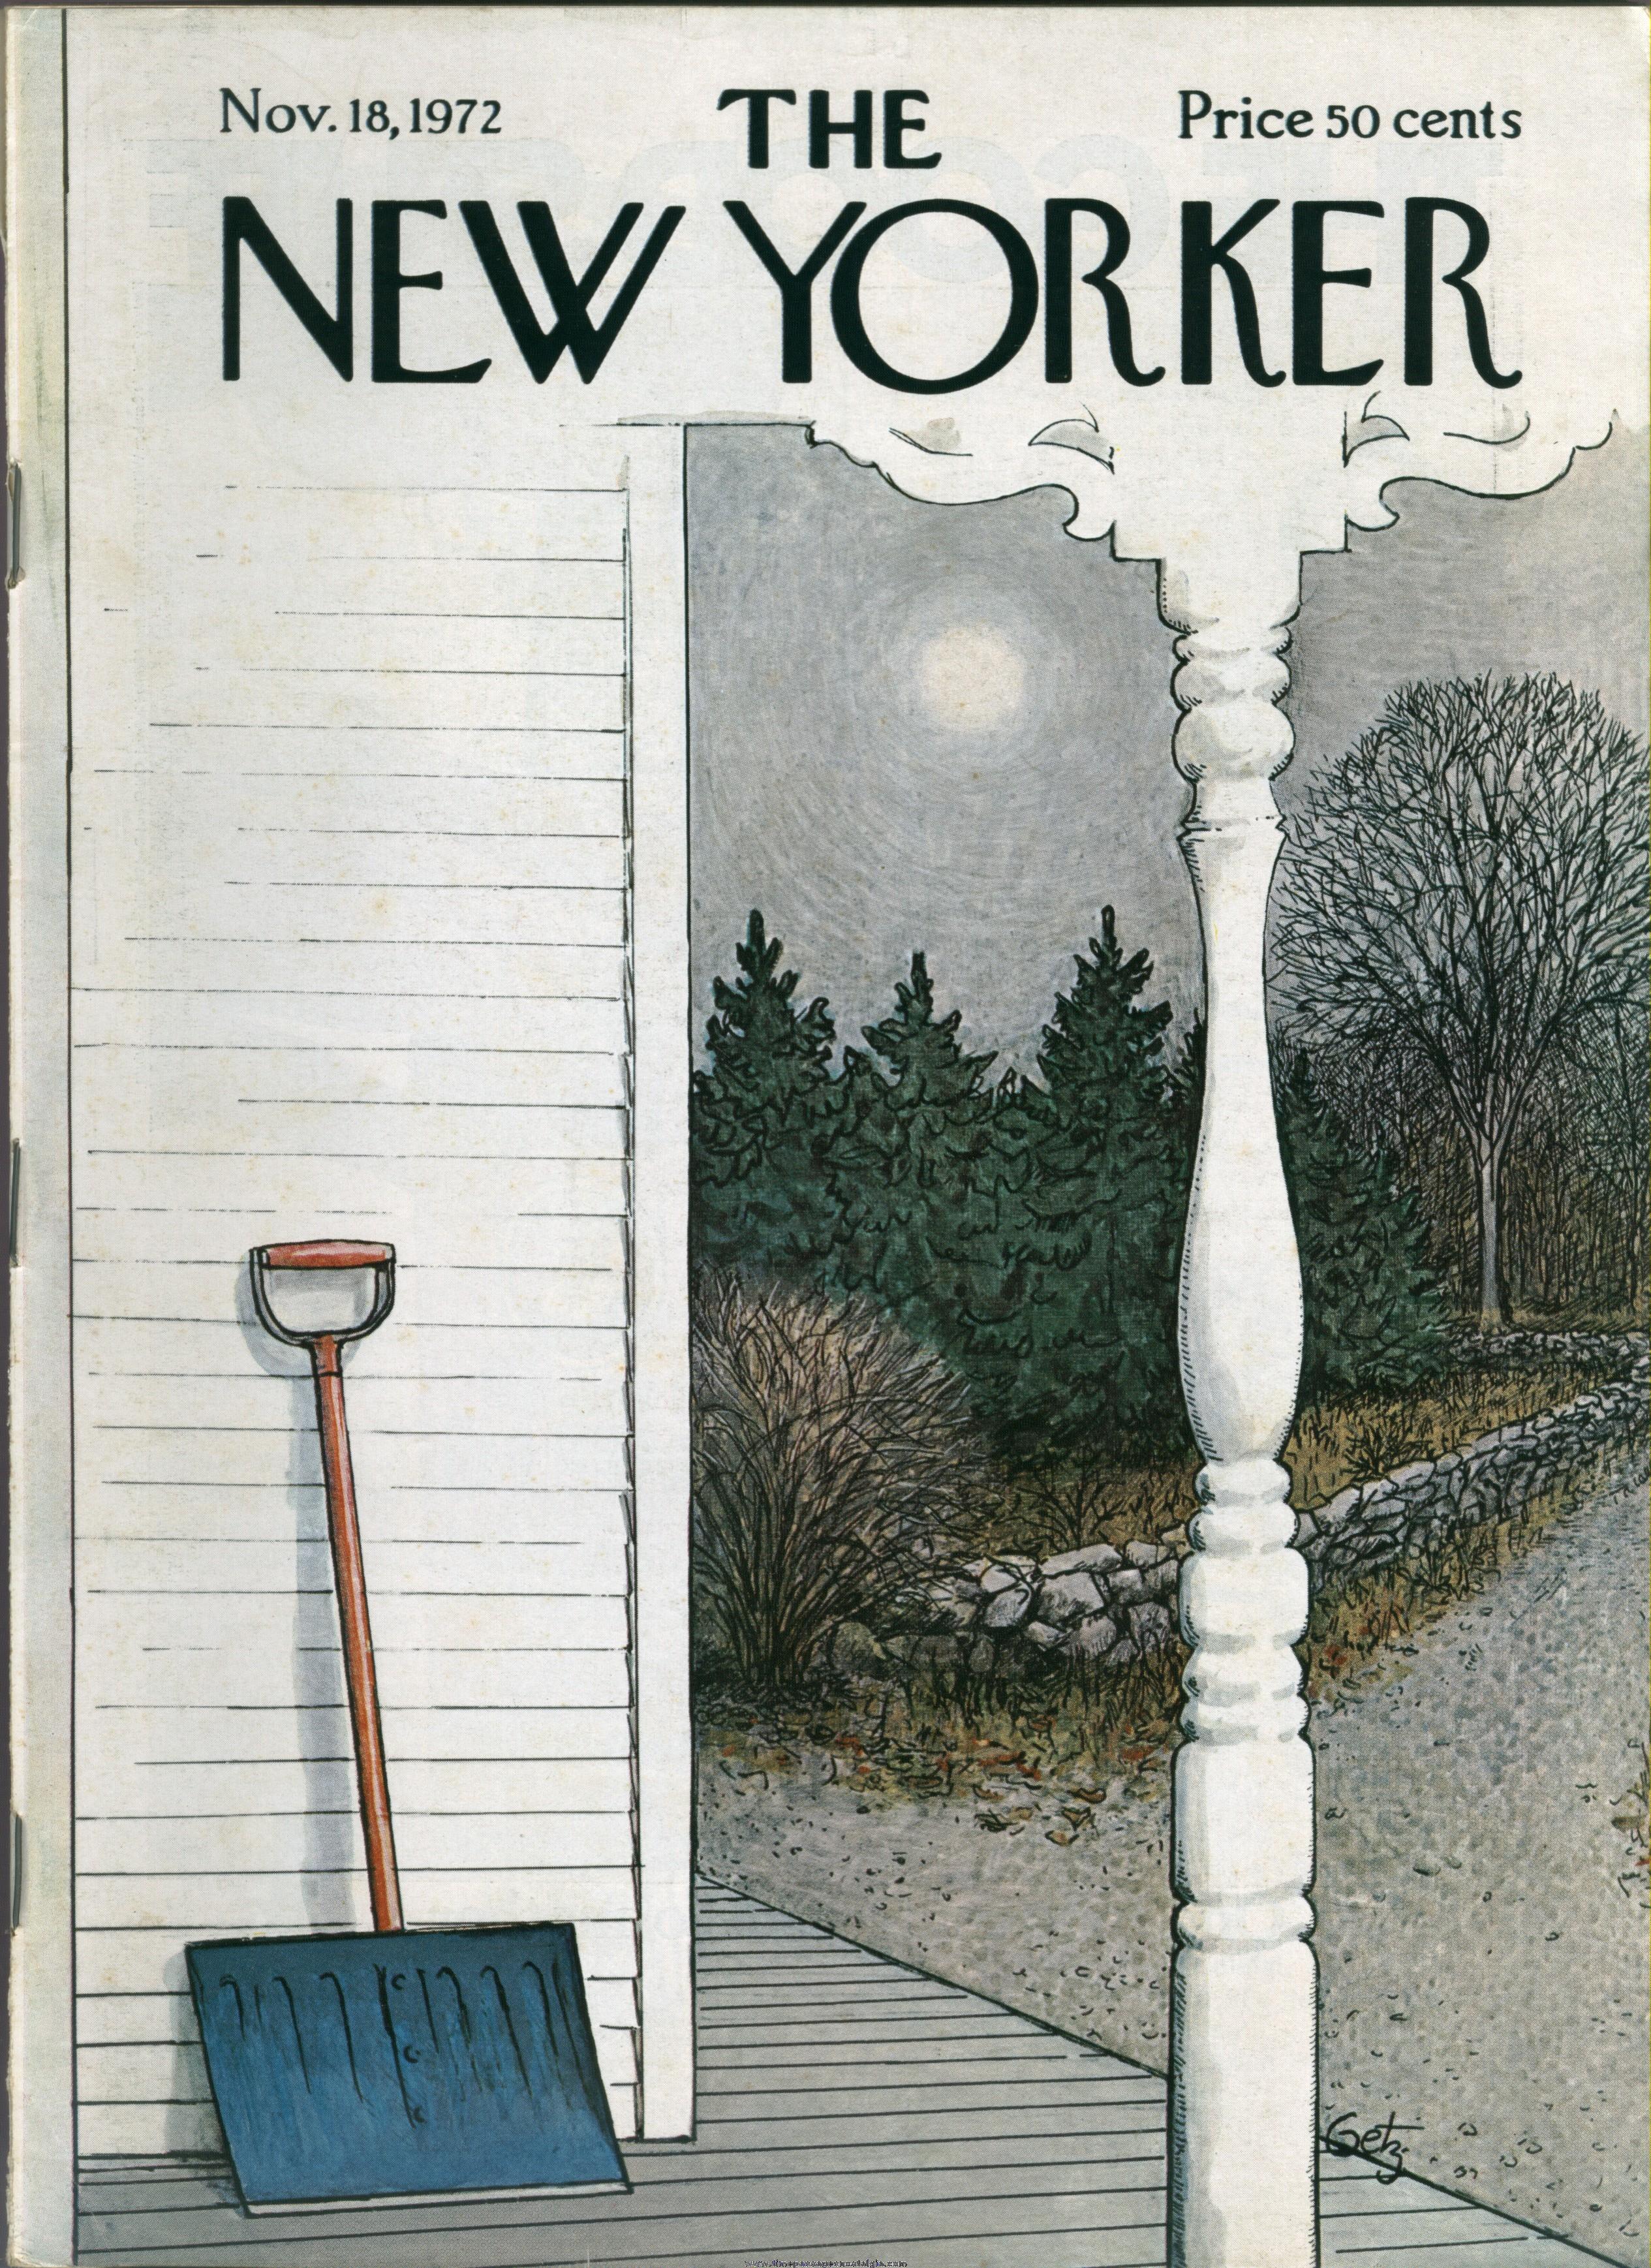 New Yorker Magazine - November 18, 1972 - Cover by Arthur Getz